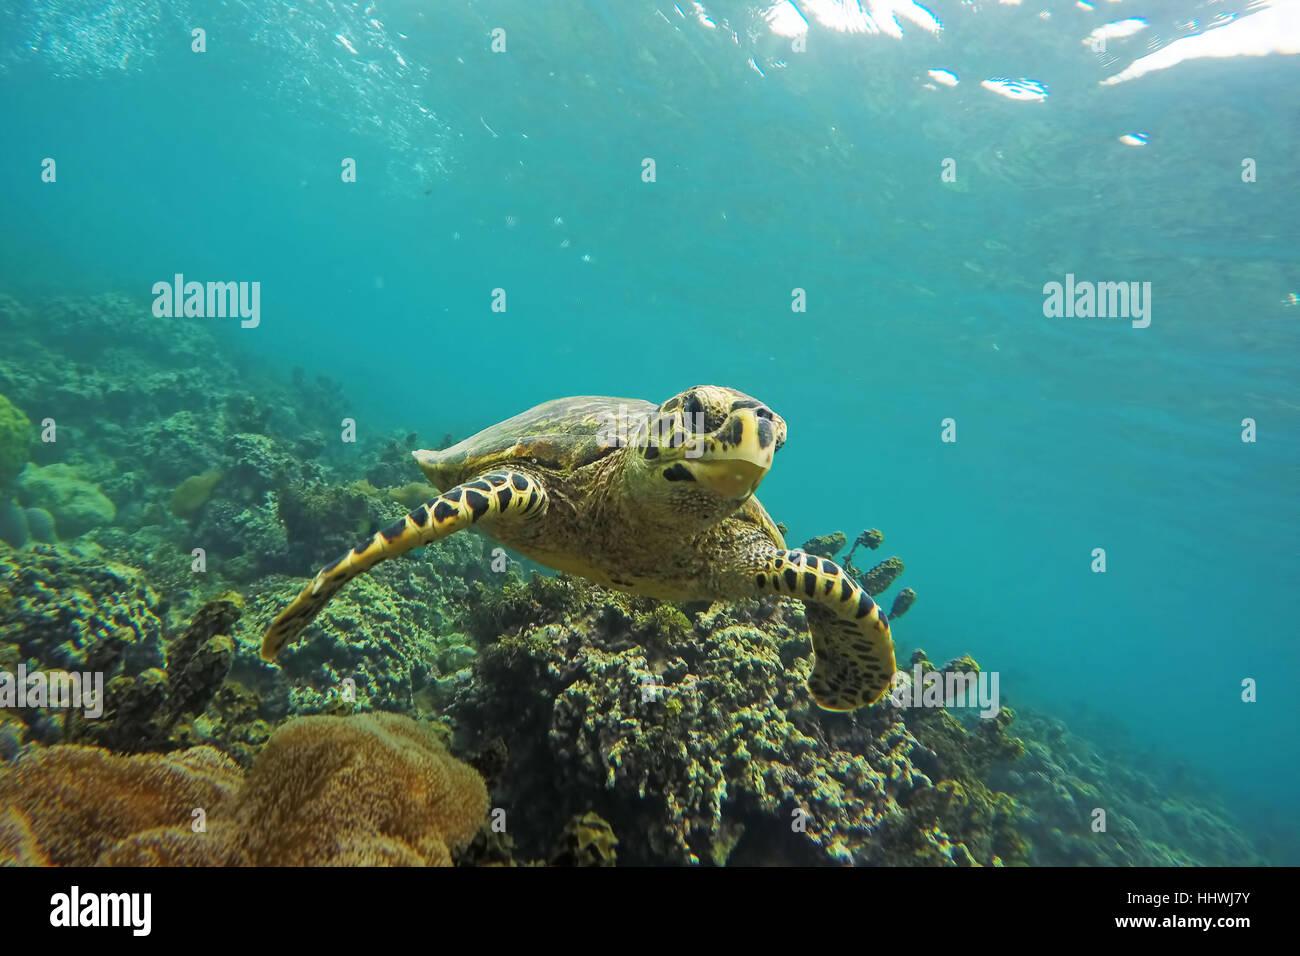 Green Turtle (Chelonia mydas) swims over reef, Seychelles - Stock Image